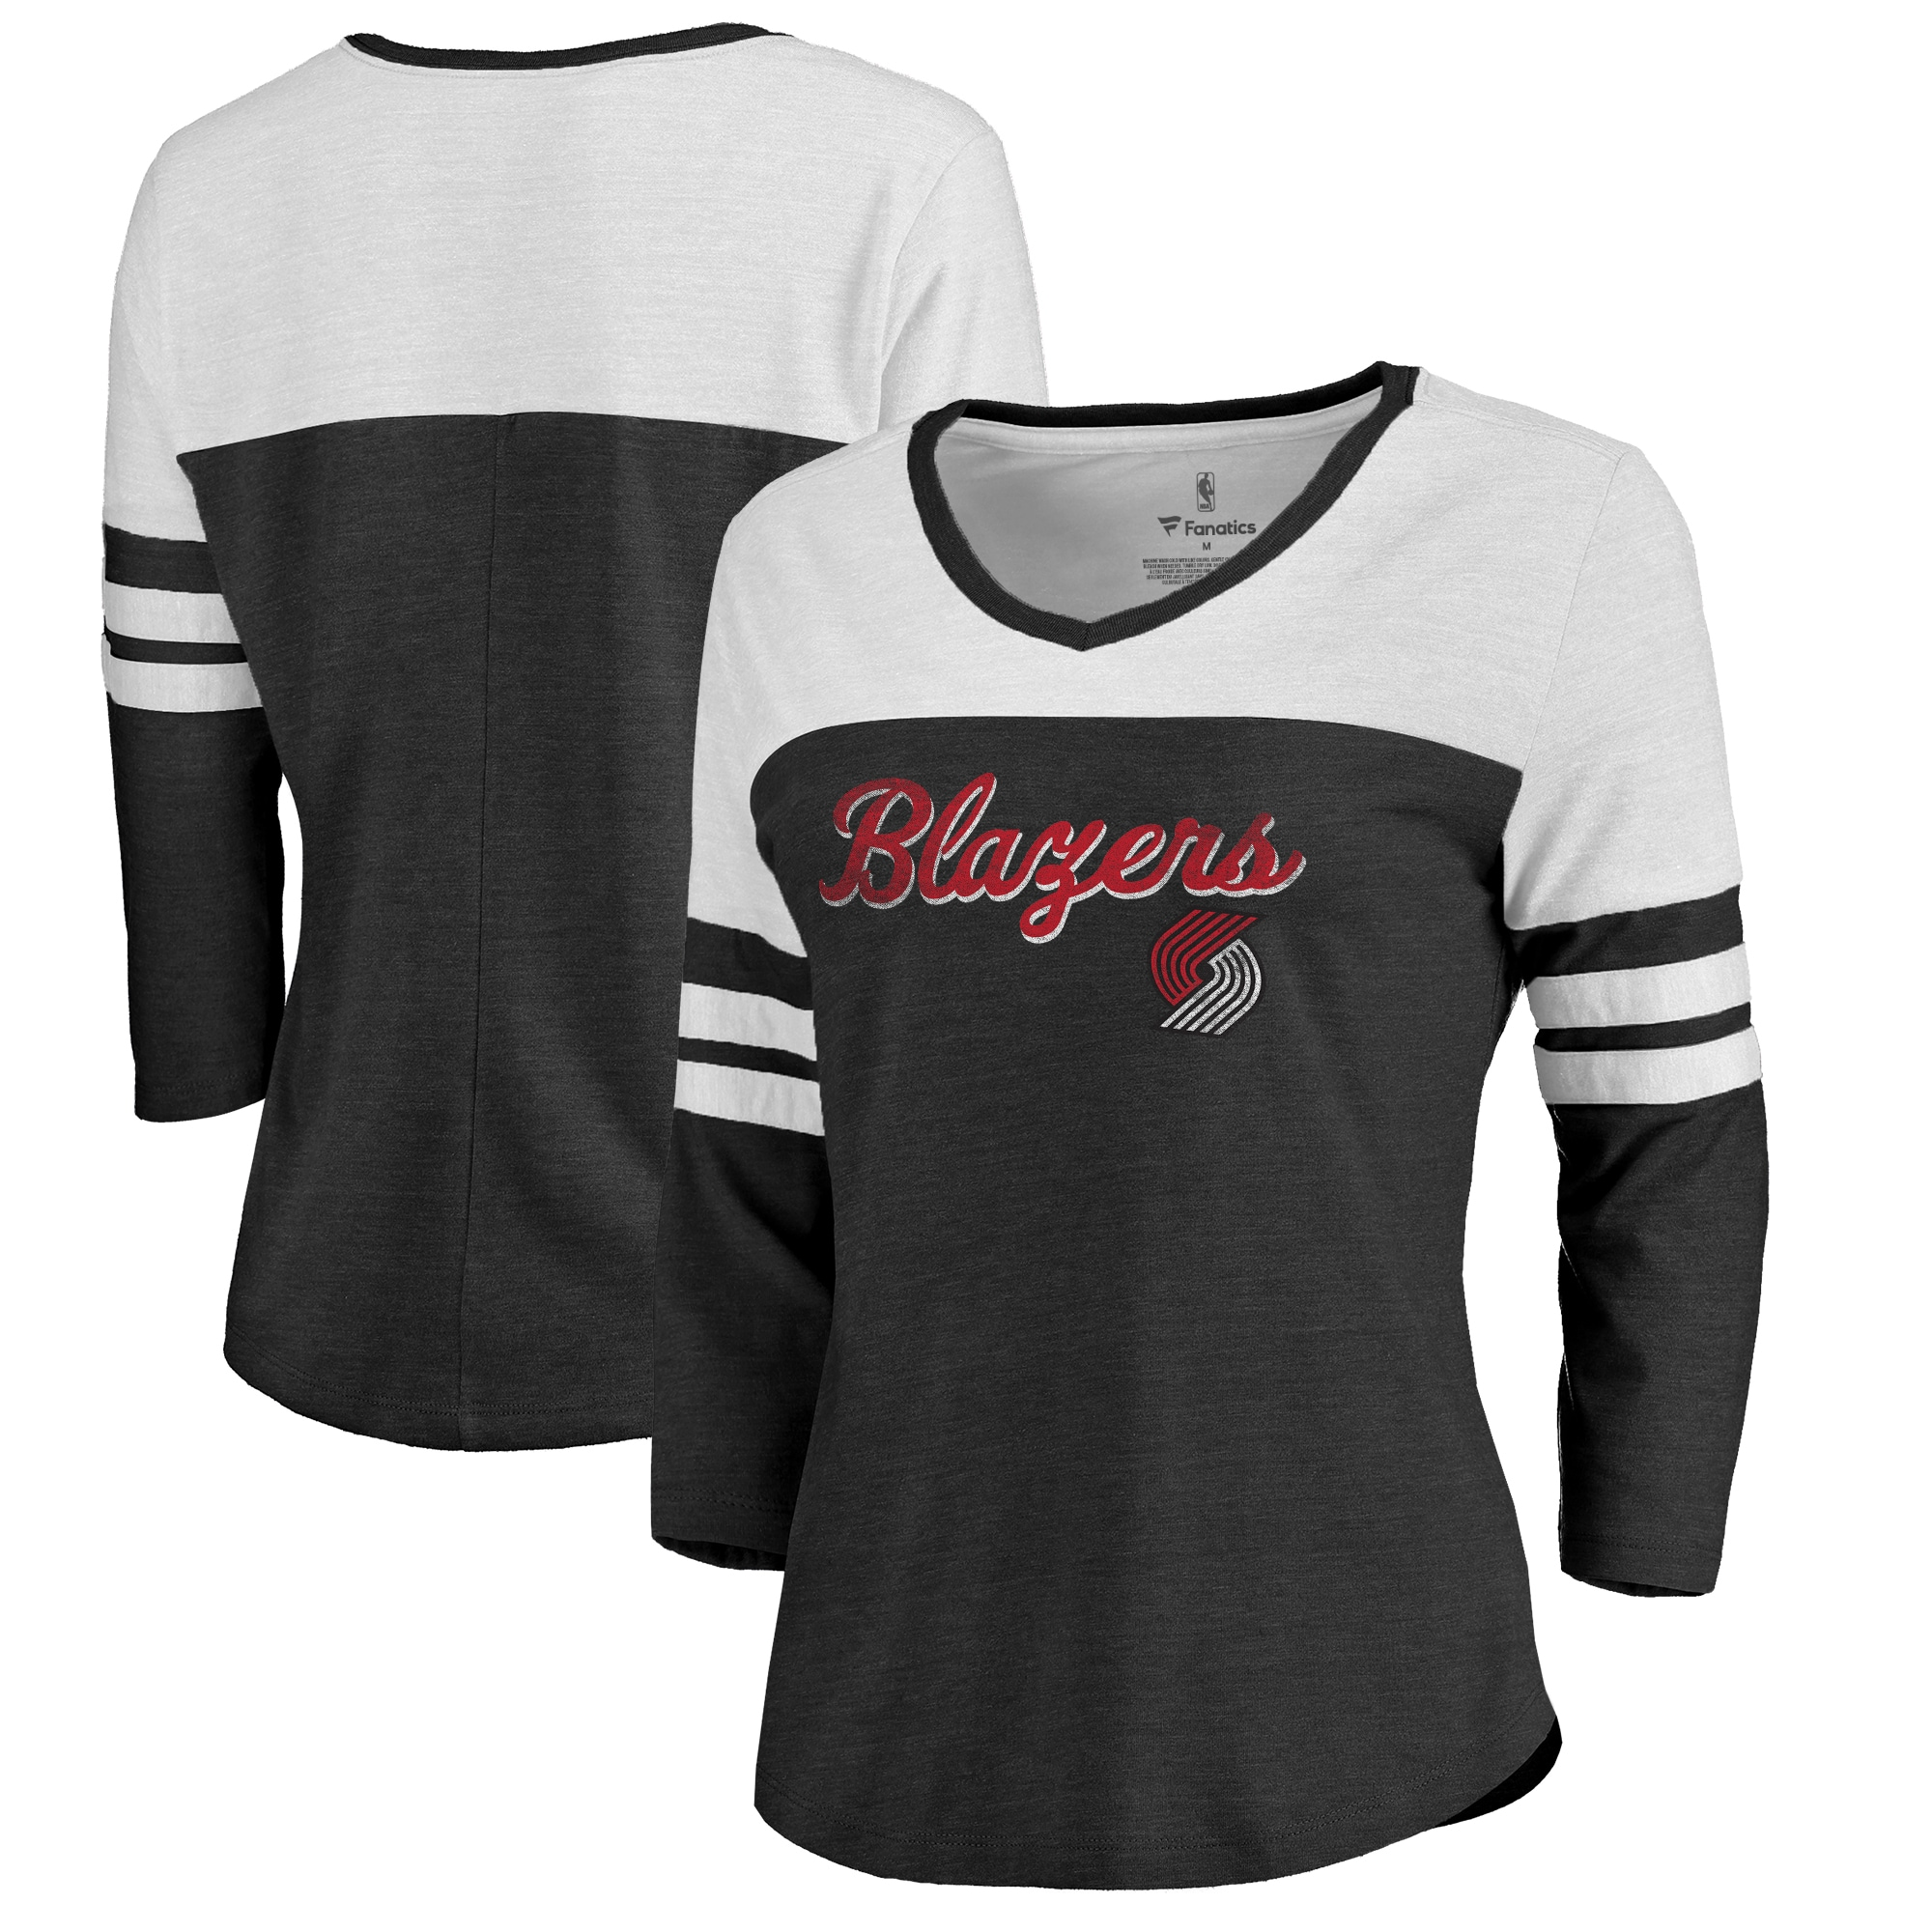 Portland Trail Blazers Fanatics Branded Women's Rising Script Color Block 3/4 Sleeve Tri-Blend T-Shirt - Black